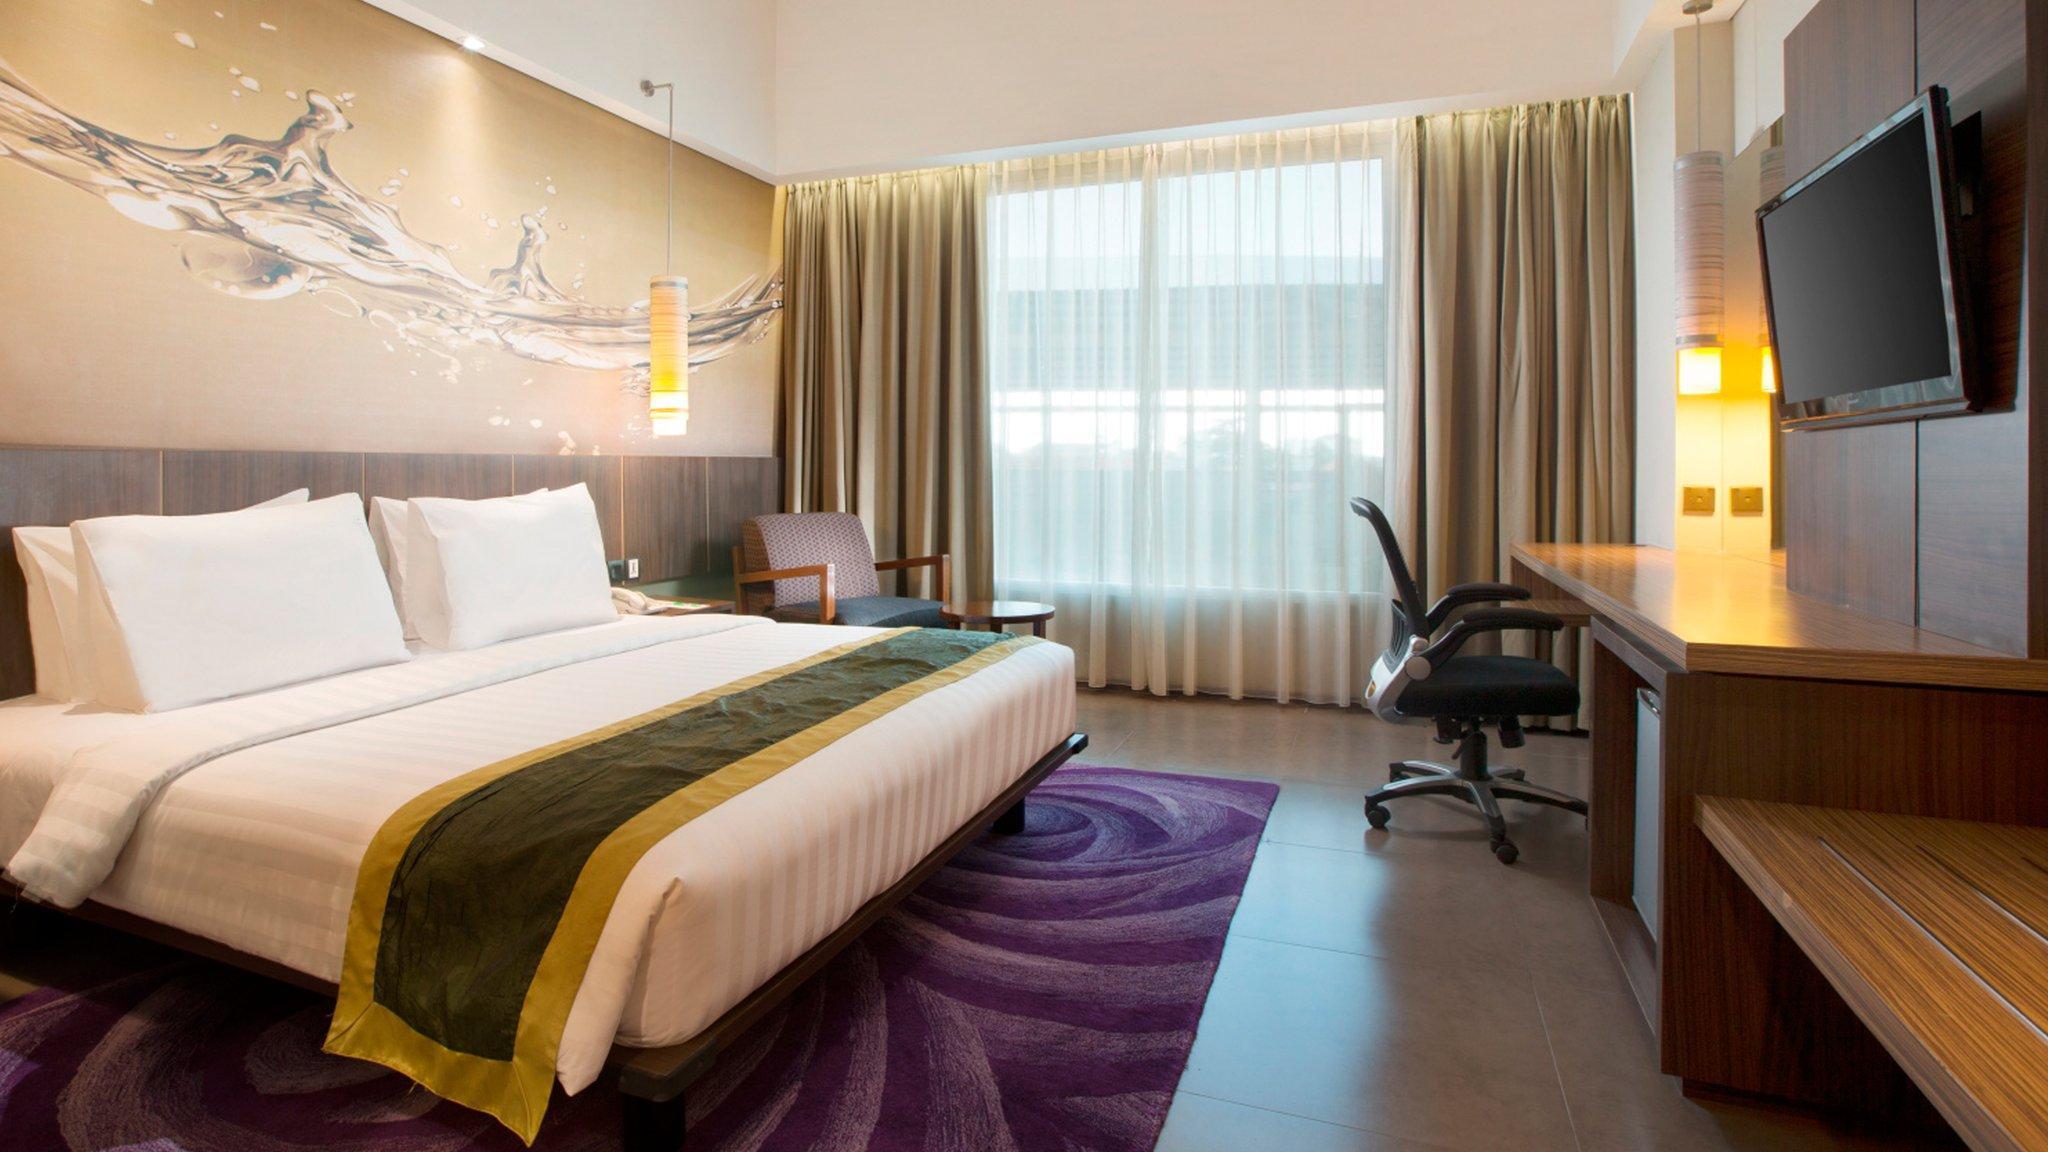 Holiday Inn Bandung Pasteur (Formerly Aston Primera Pasteur)